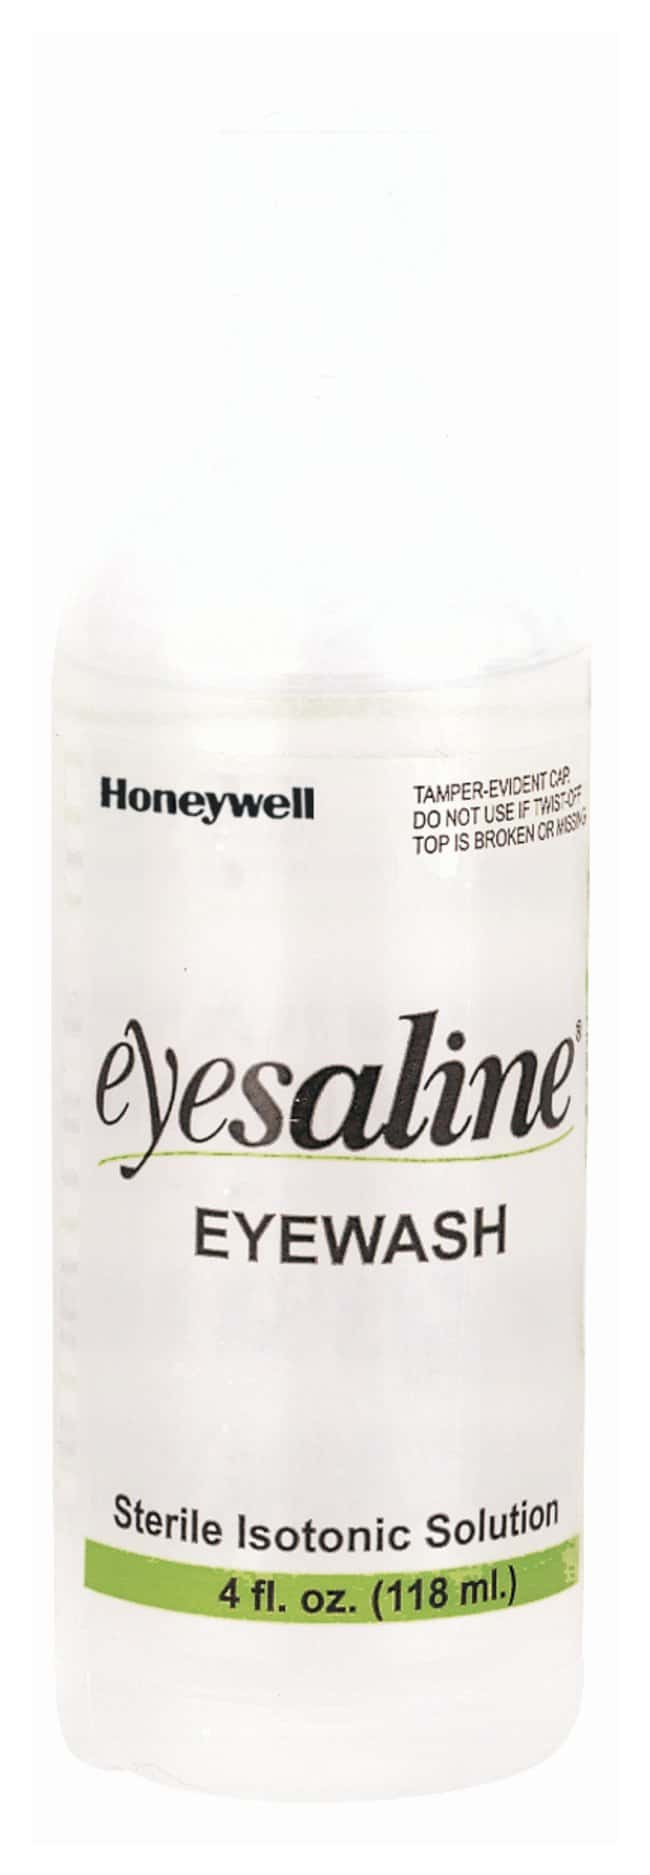 HoneywellEyesaline Personal Eyewash Bottle 4 oz.:Facility Safety and Maintenance